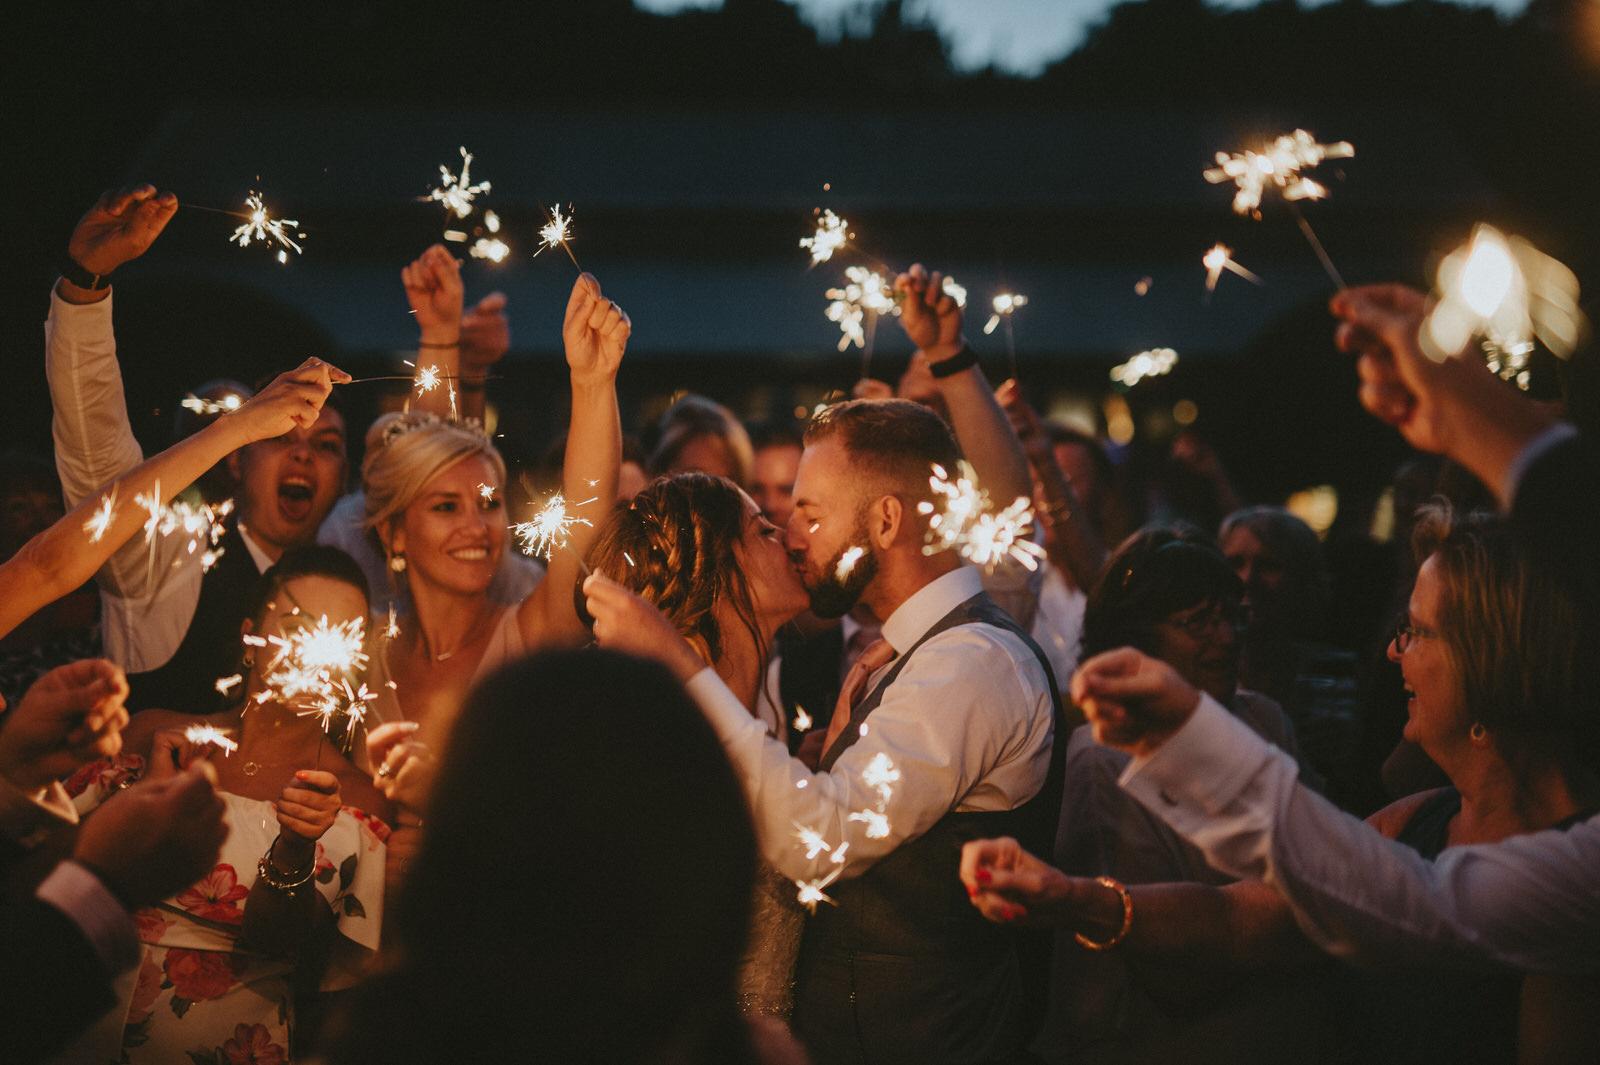 Hazel Gap - Flawless Photography - 29.07.2018 - Colette & Steve Dhazel+gap+nottinghamshire+wedding+venue.jpg